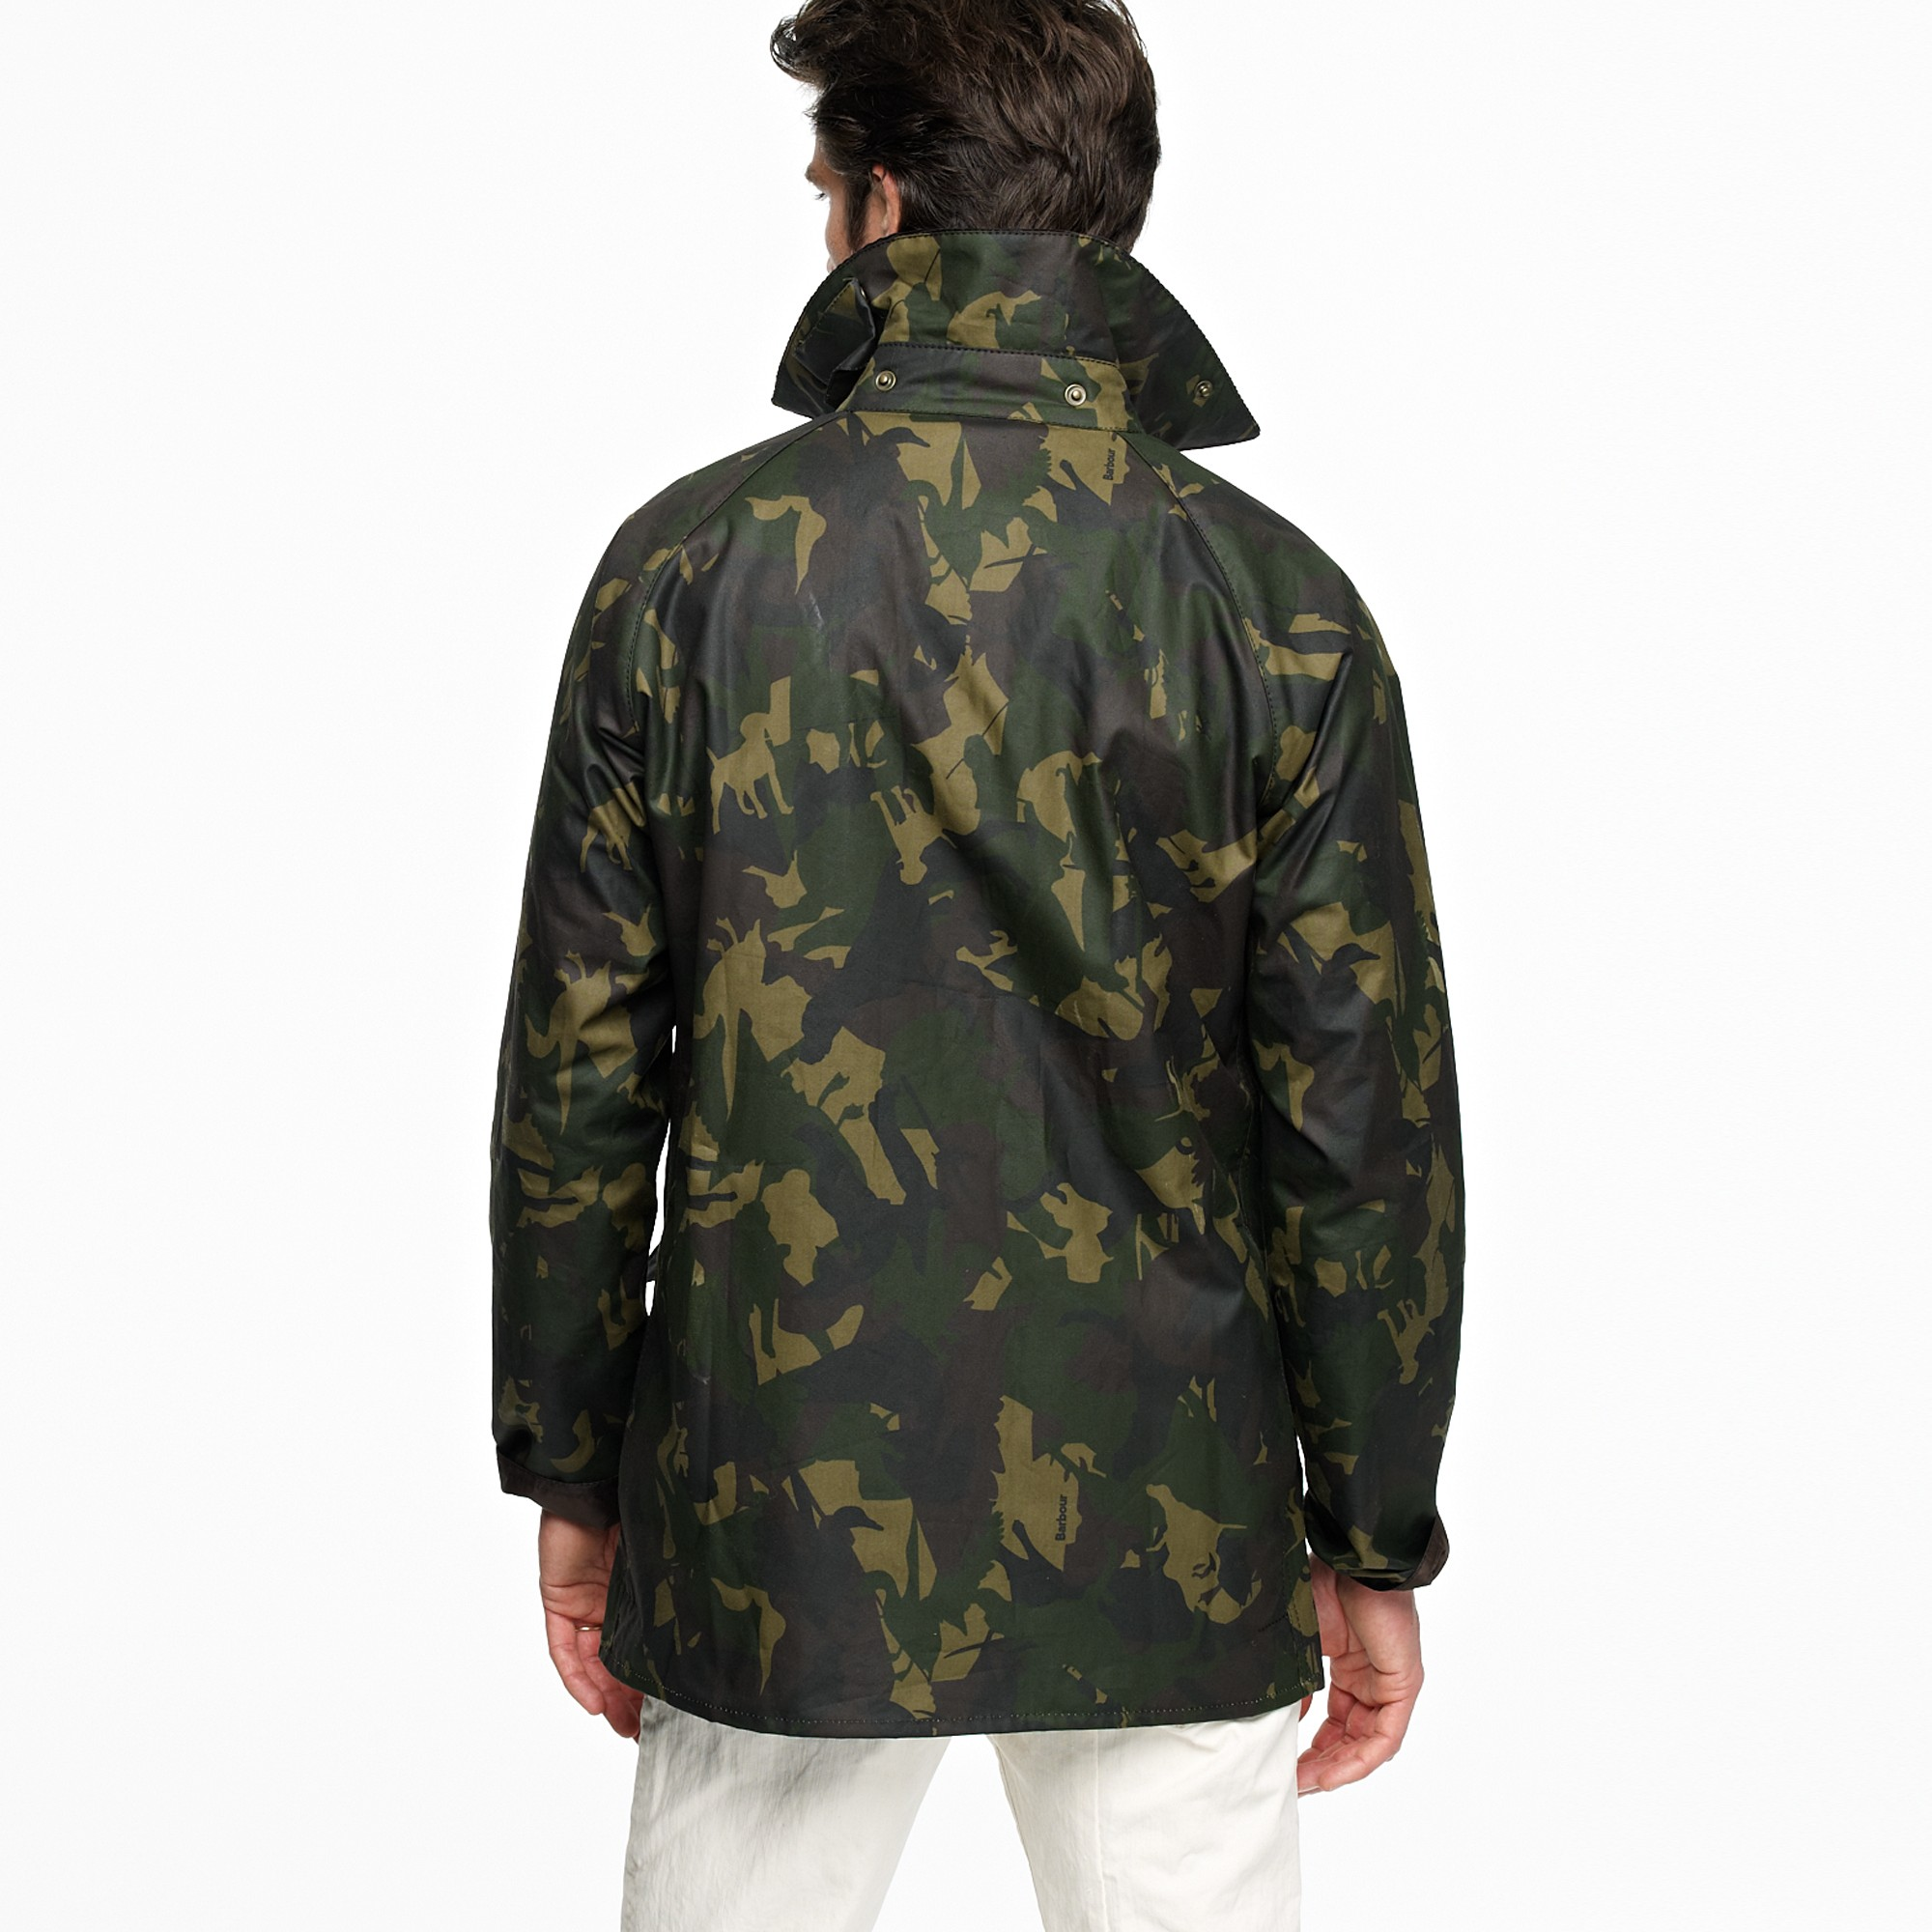 9d8458c03d6d for Bourne Lyst Crew J Men Barbour Jacket Camo in Green qZg1w